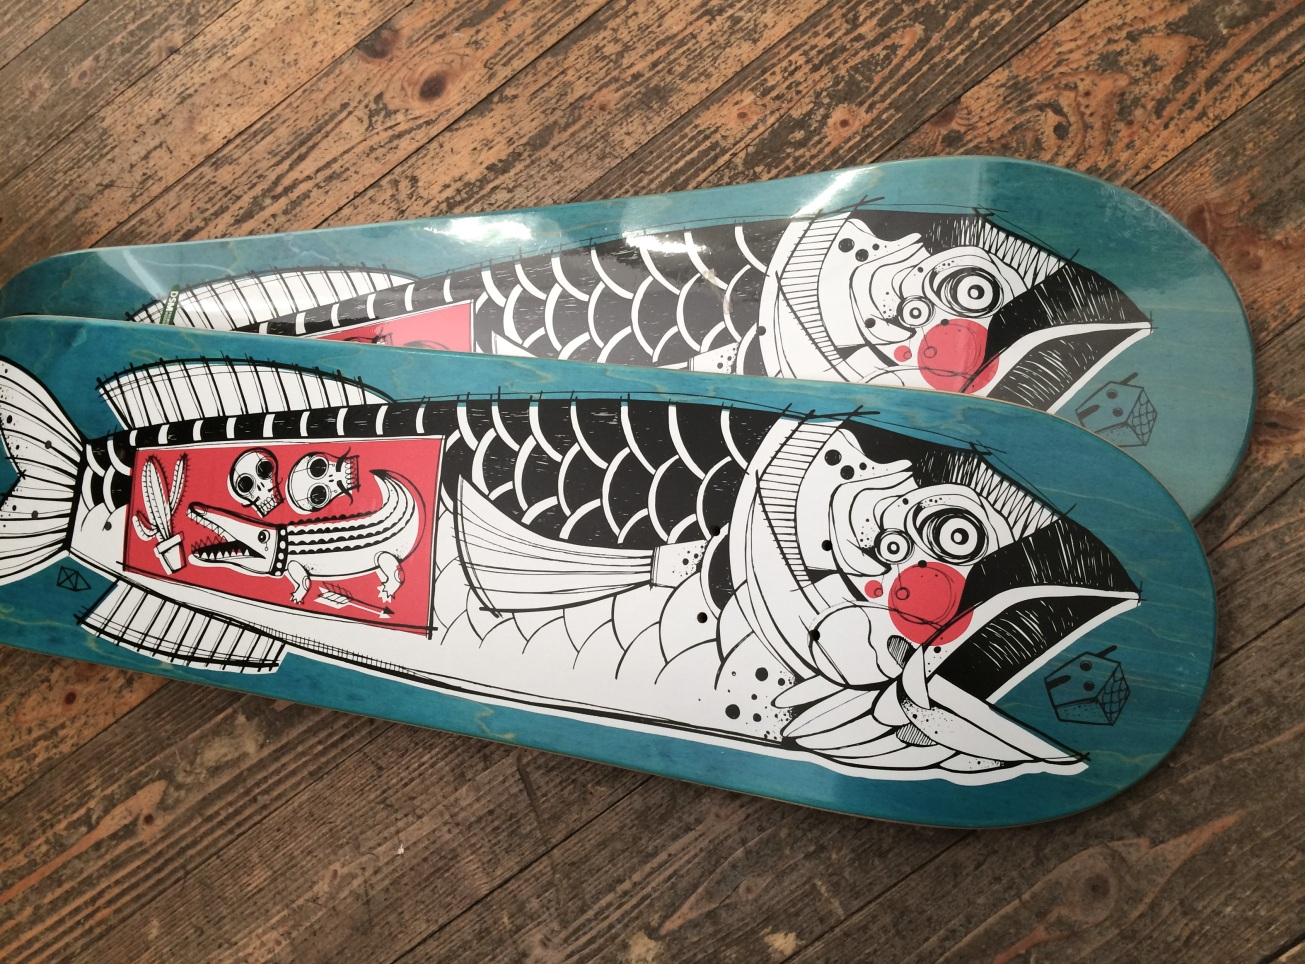 Miriam_Frank_Tattoo_skateboard_muckefuck